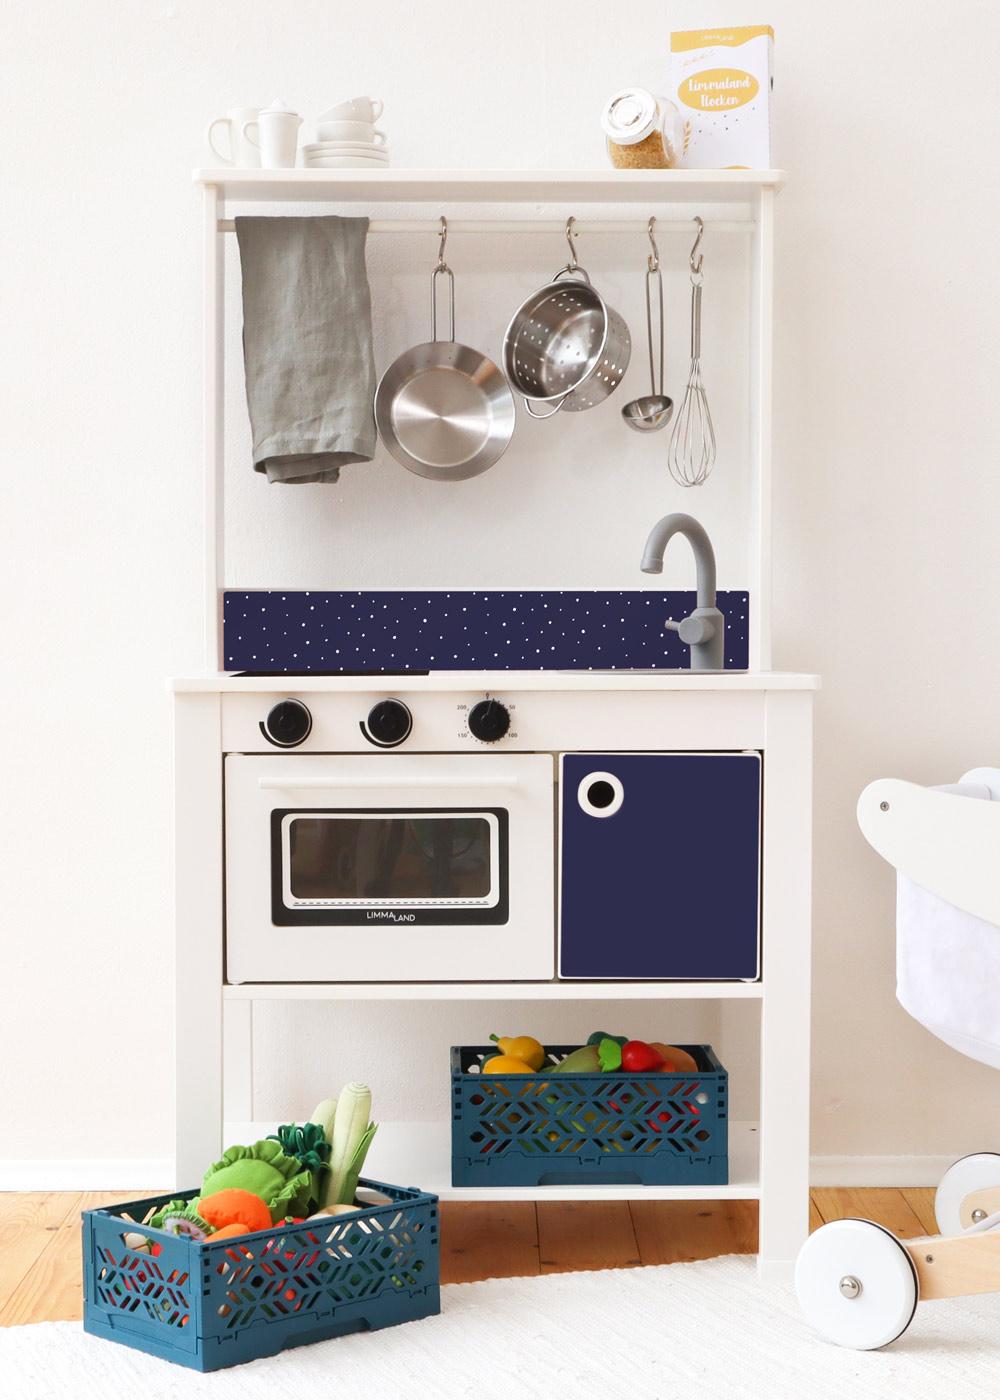 Ikea Spisig Kinderküche Tüpfelig Nachtblau